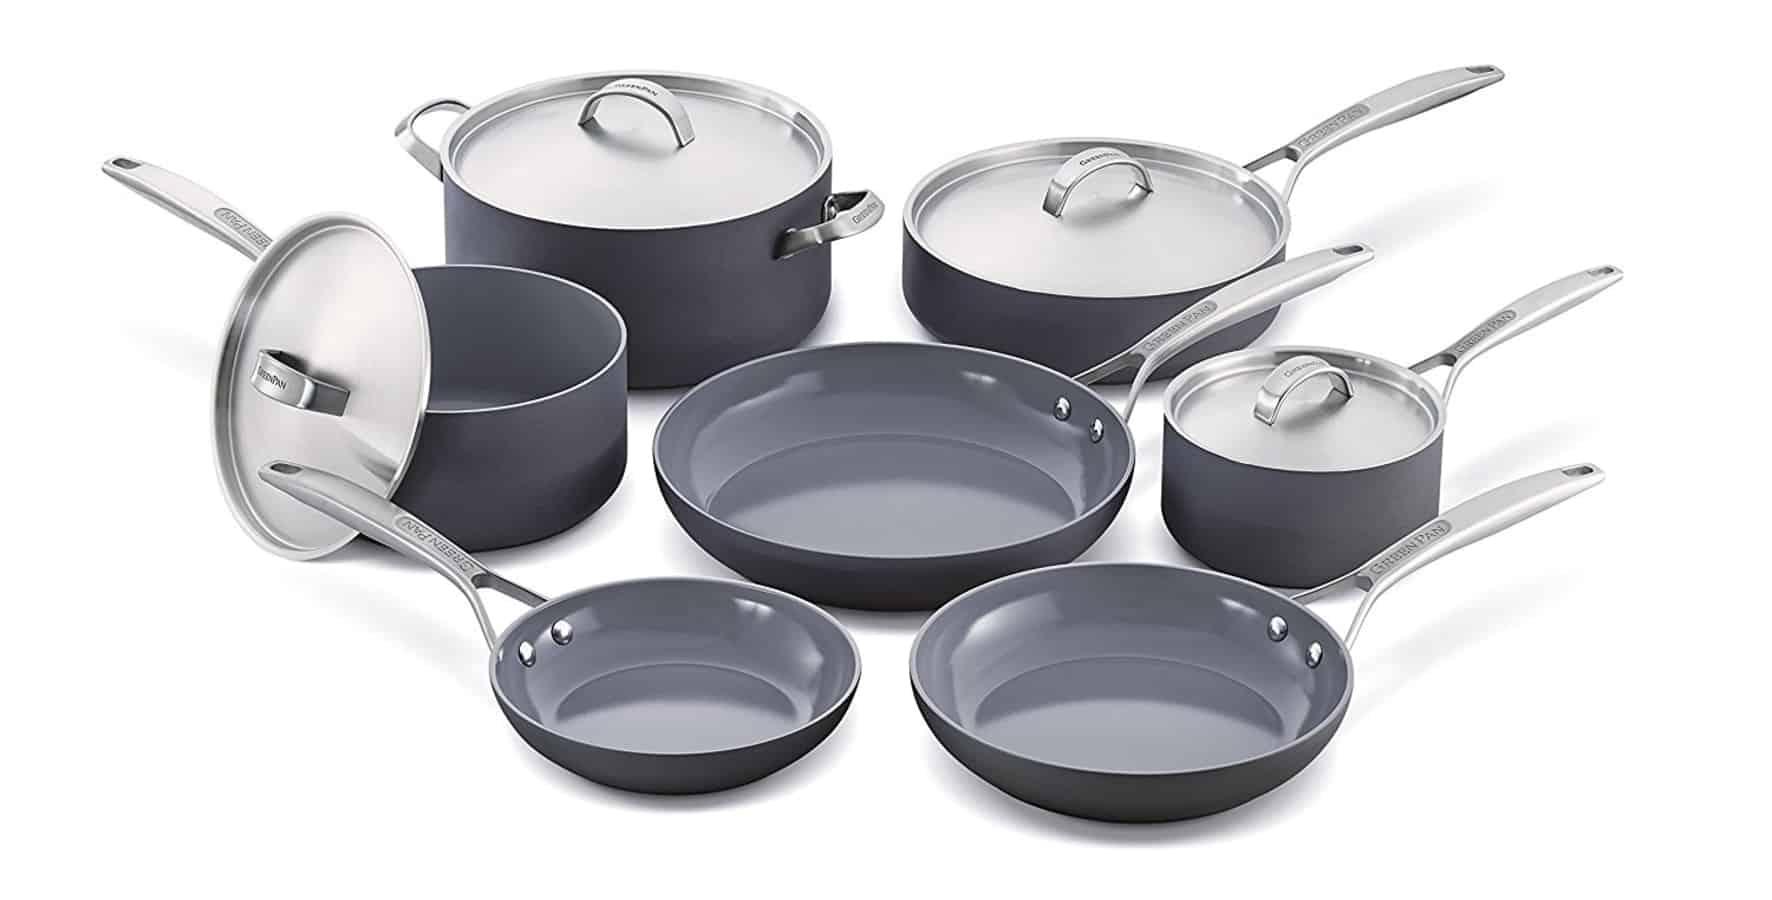 Top ceramic cookware set (11pc) of GreenPan Paris Pro Ceramic Non-Stick Cookware Set